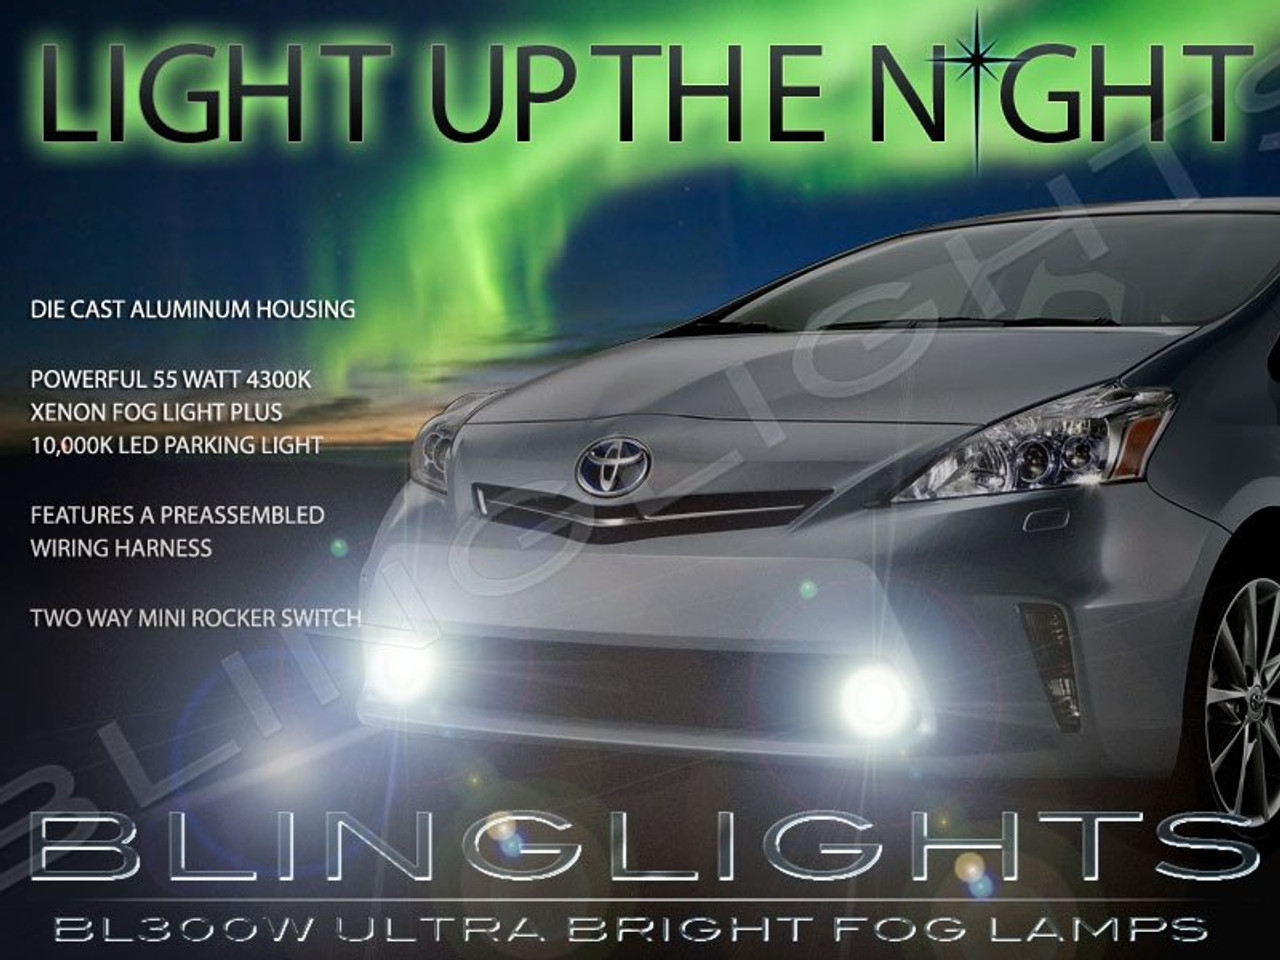 2012 2013 2014 Prius V Fog Lamp Driving Lights Kit Toyota Xenon